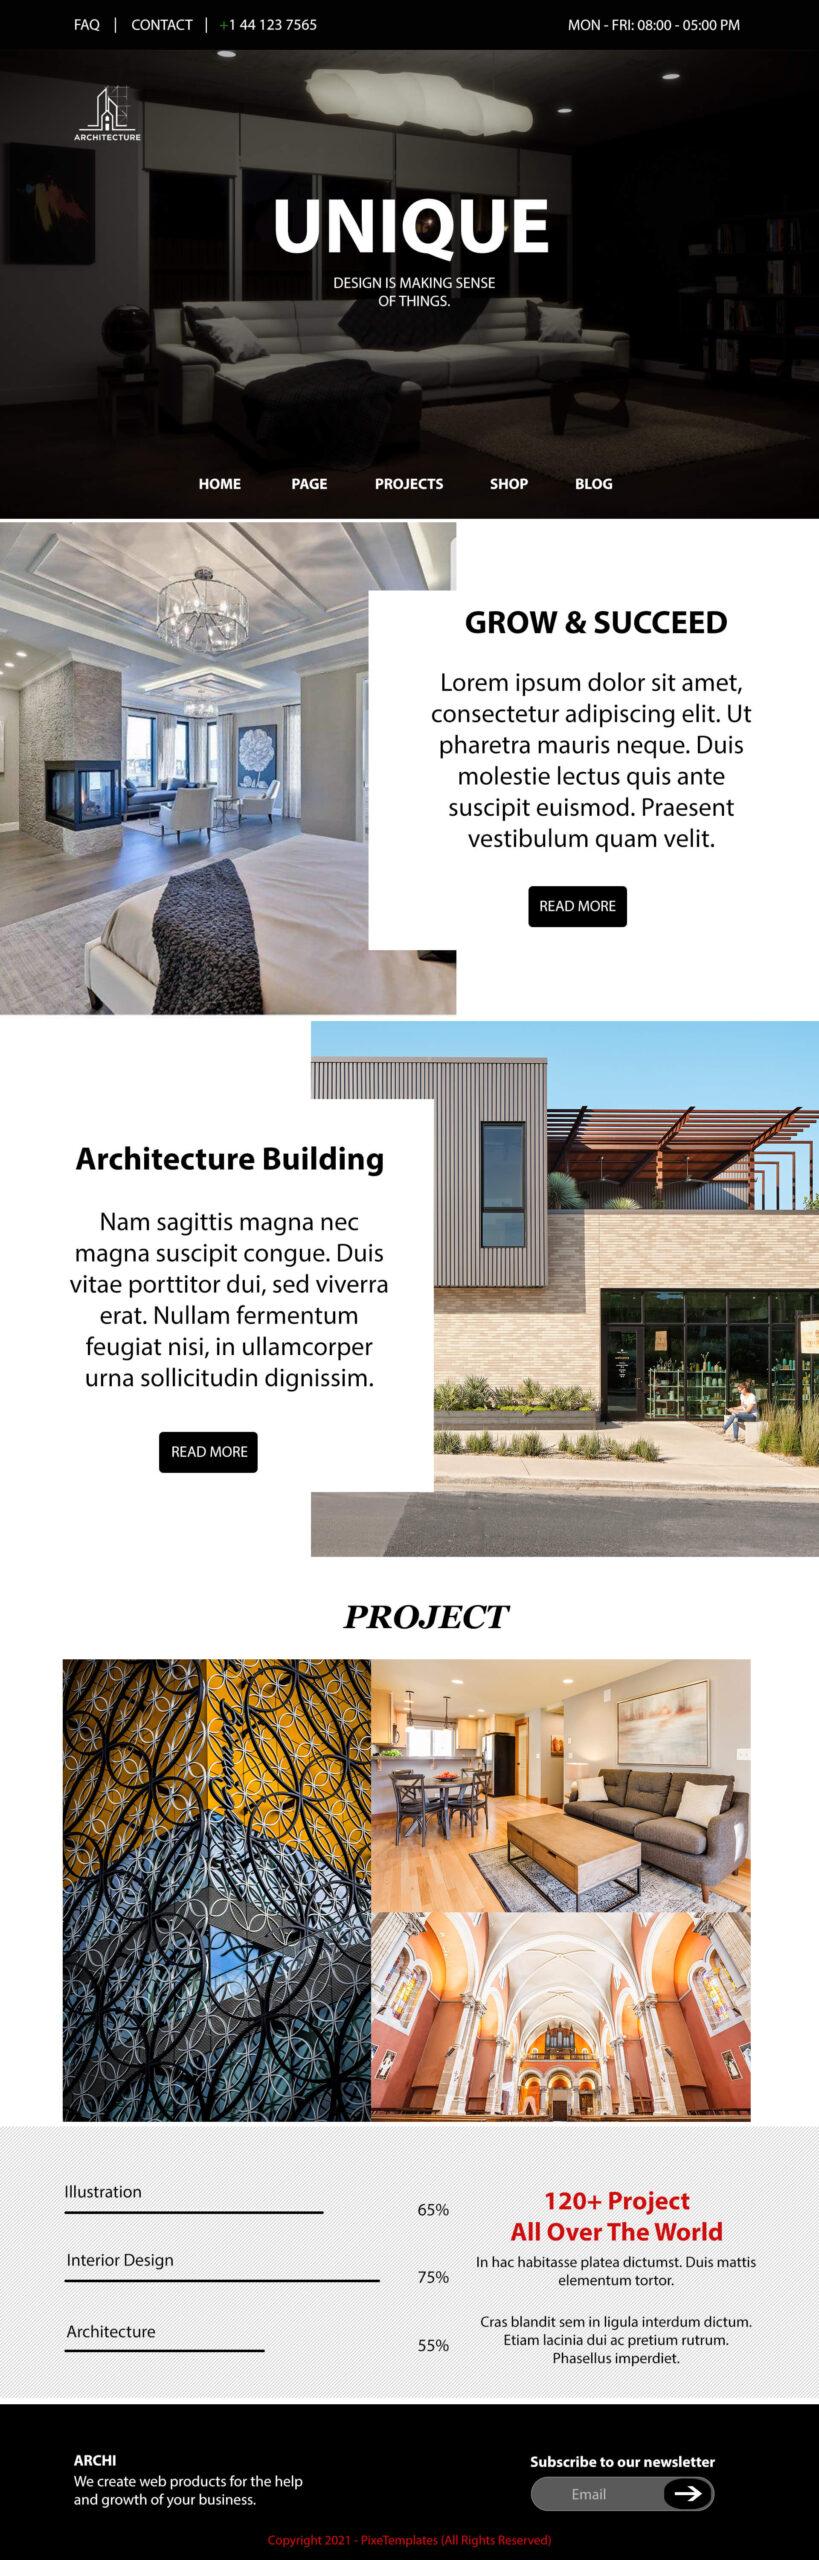 Unique Architecture Free Website Interface